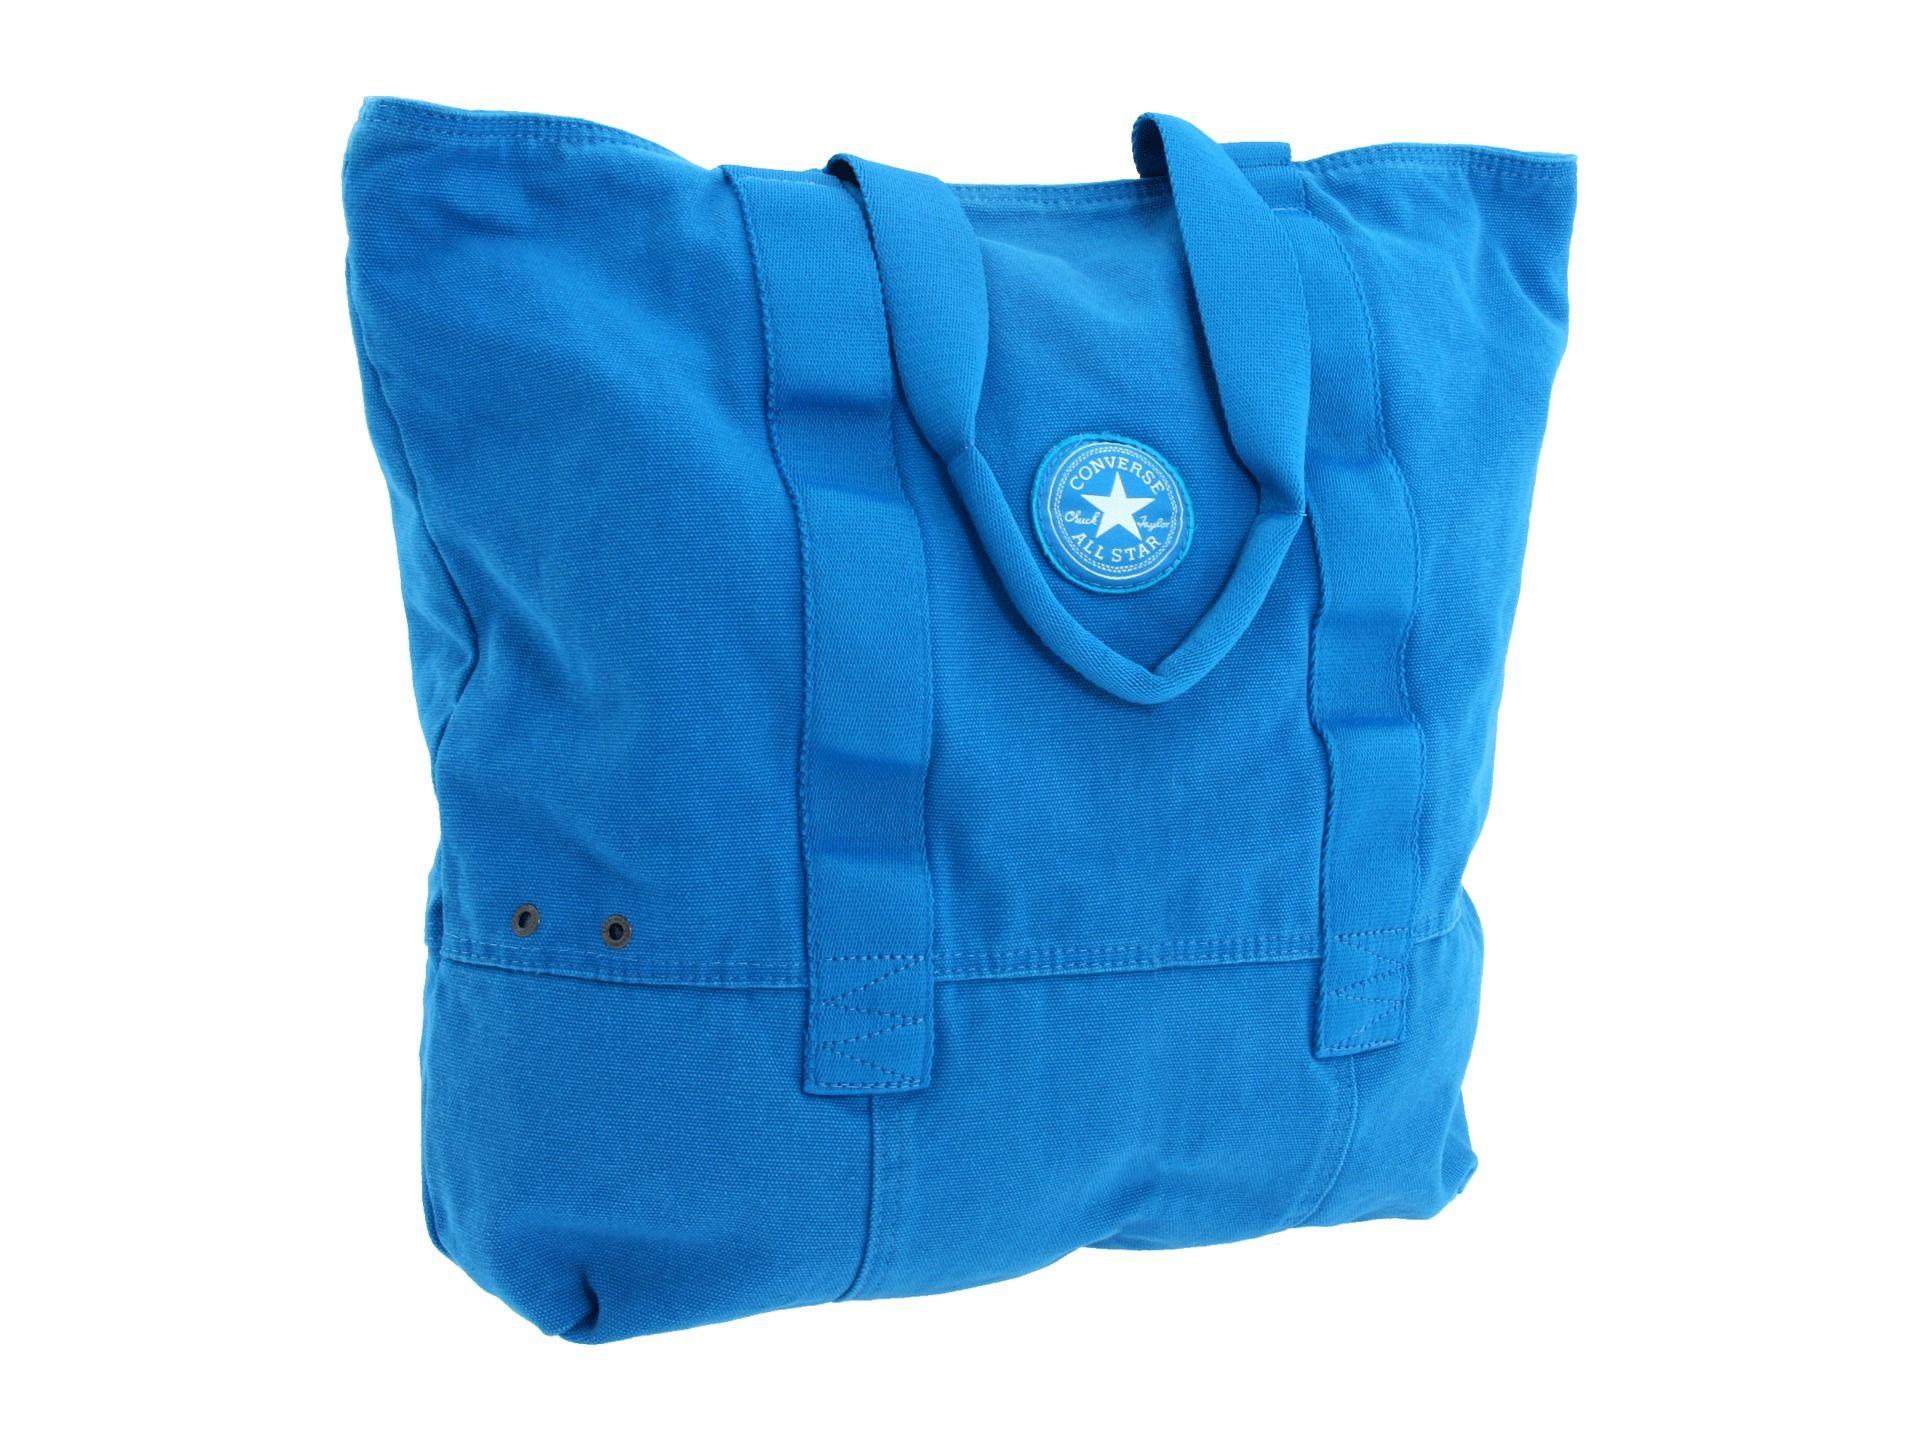 Converse Chuck Taylor® All-Star Peach Basket Tote Bag